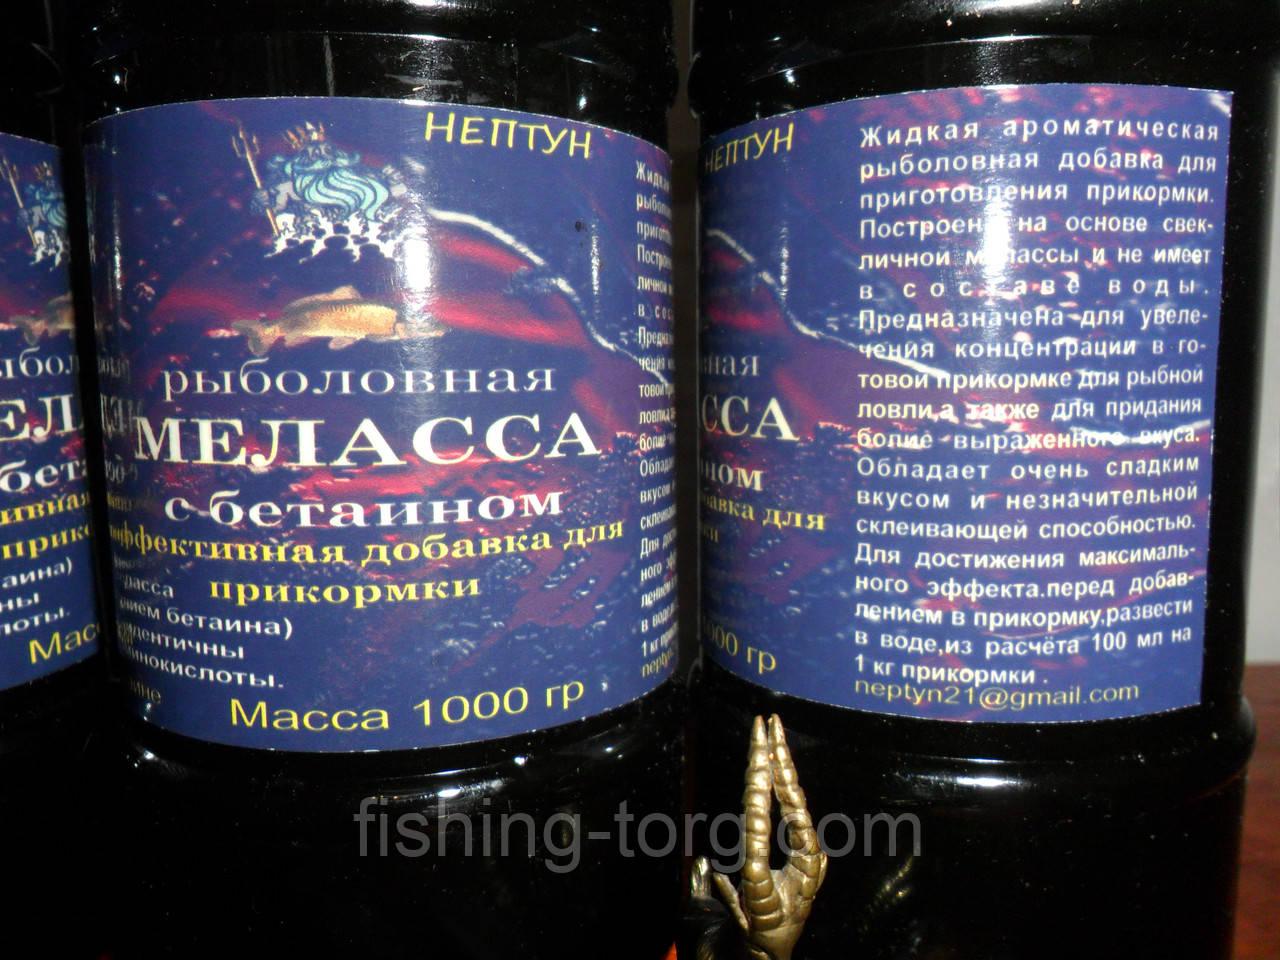 Меласса рыболовная с бетаином КУКУРУЗА 1000грамм